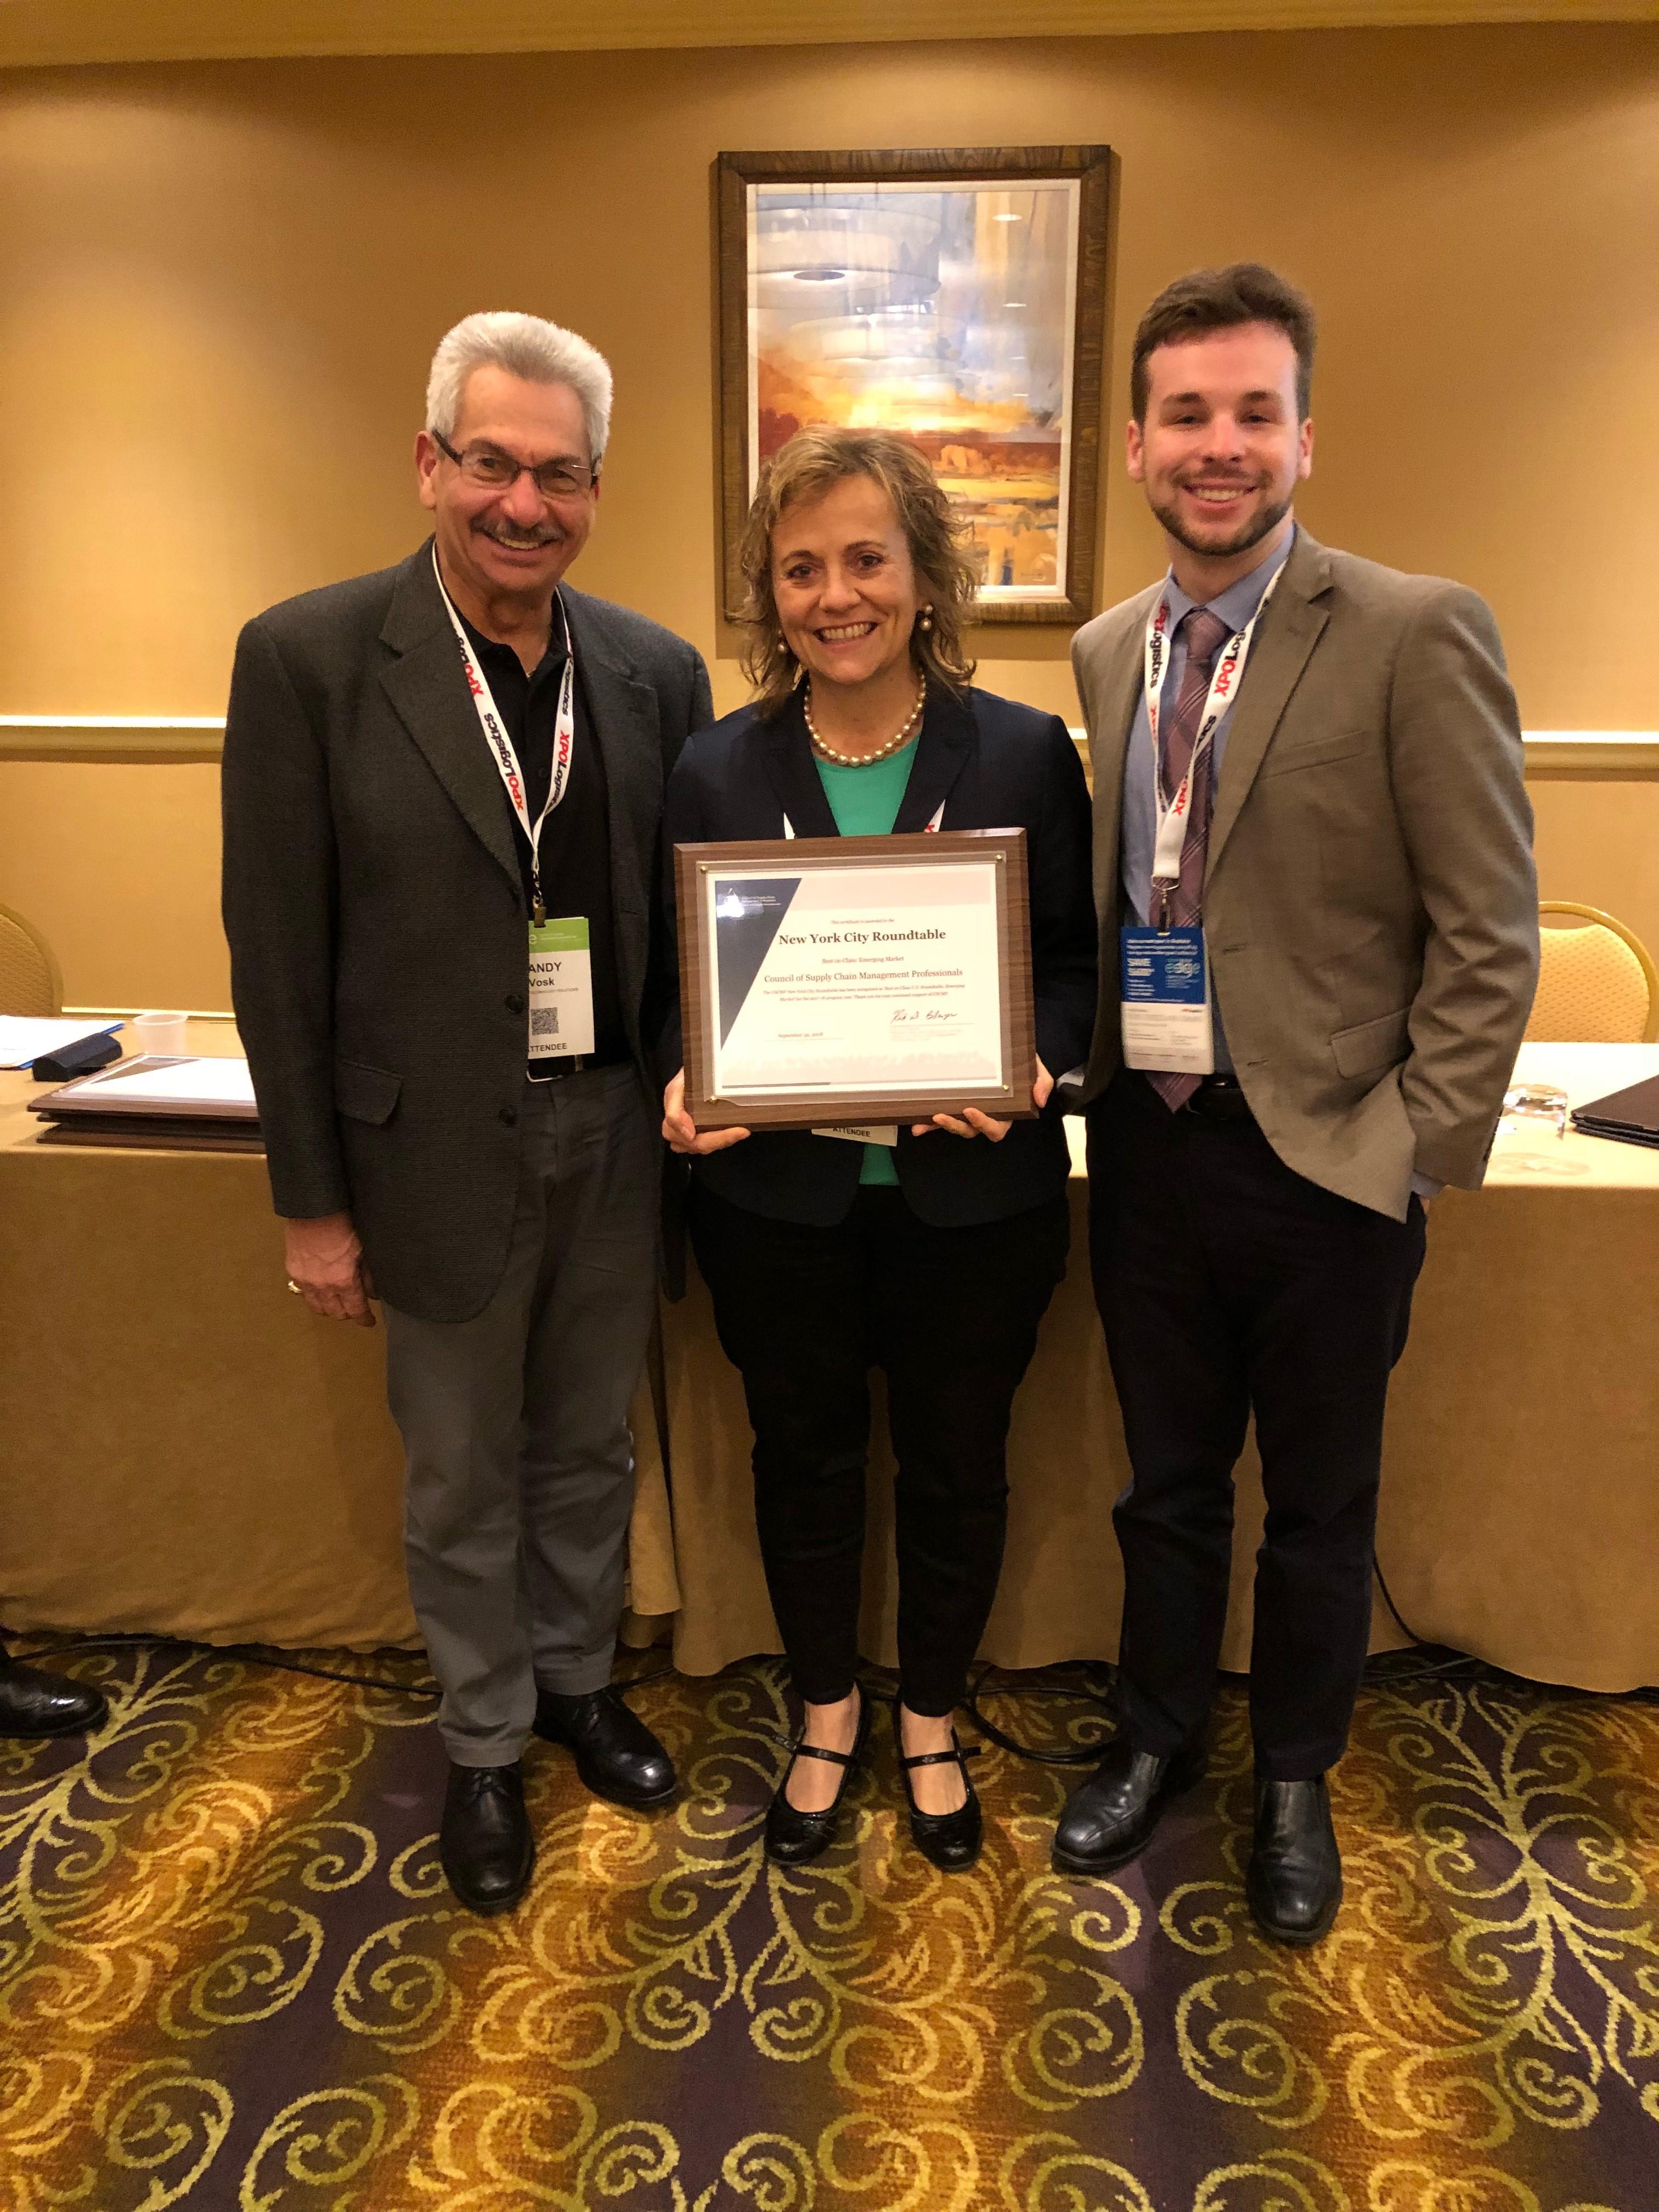 Suzanne Richer CSCMP EDGE Award